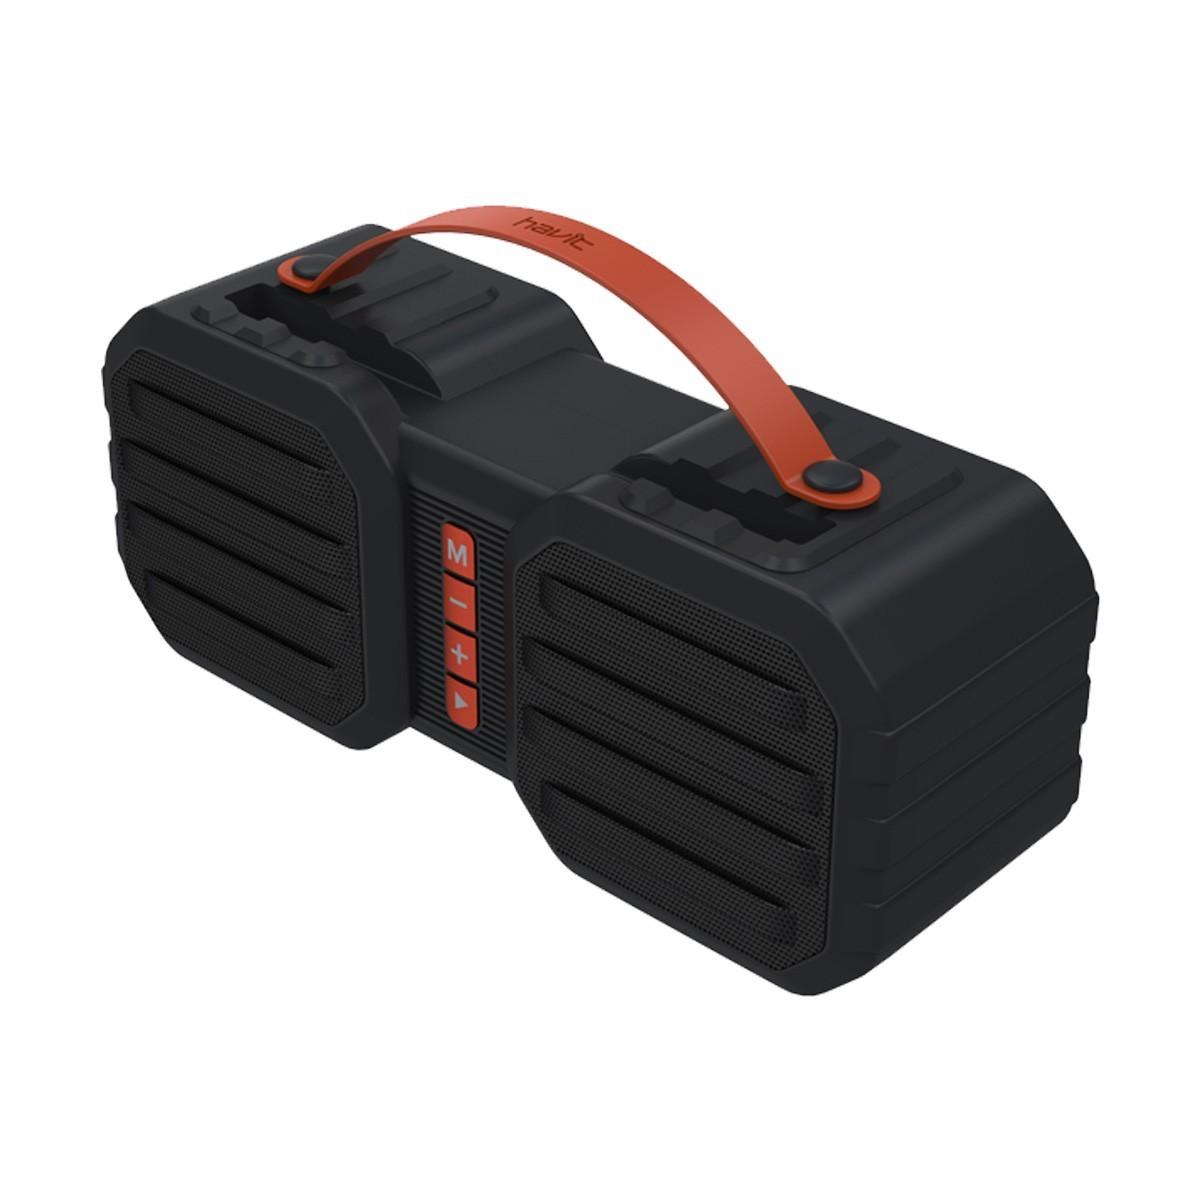 HAVIT Portable Outdoor Wireless Speaker – SK802BT